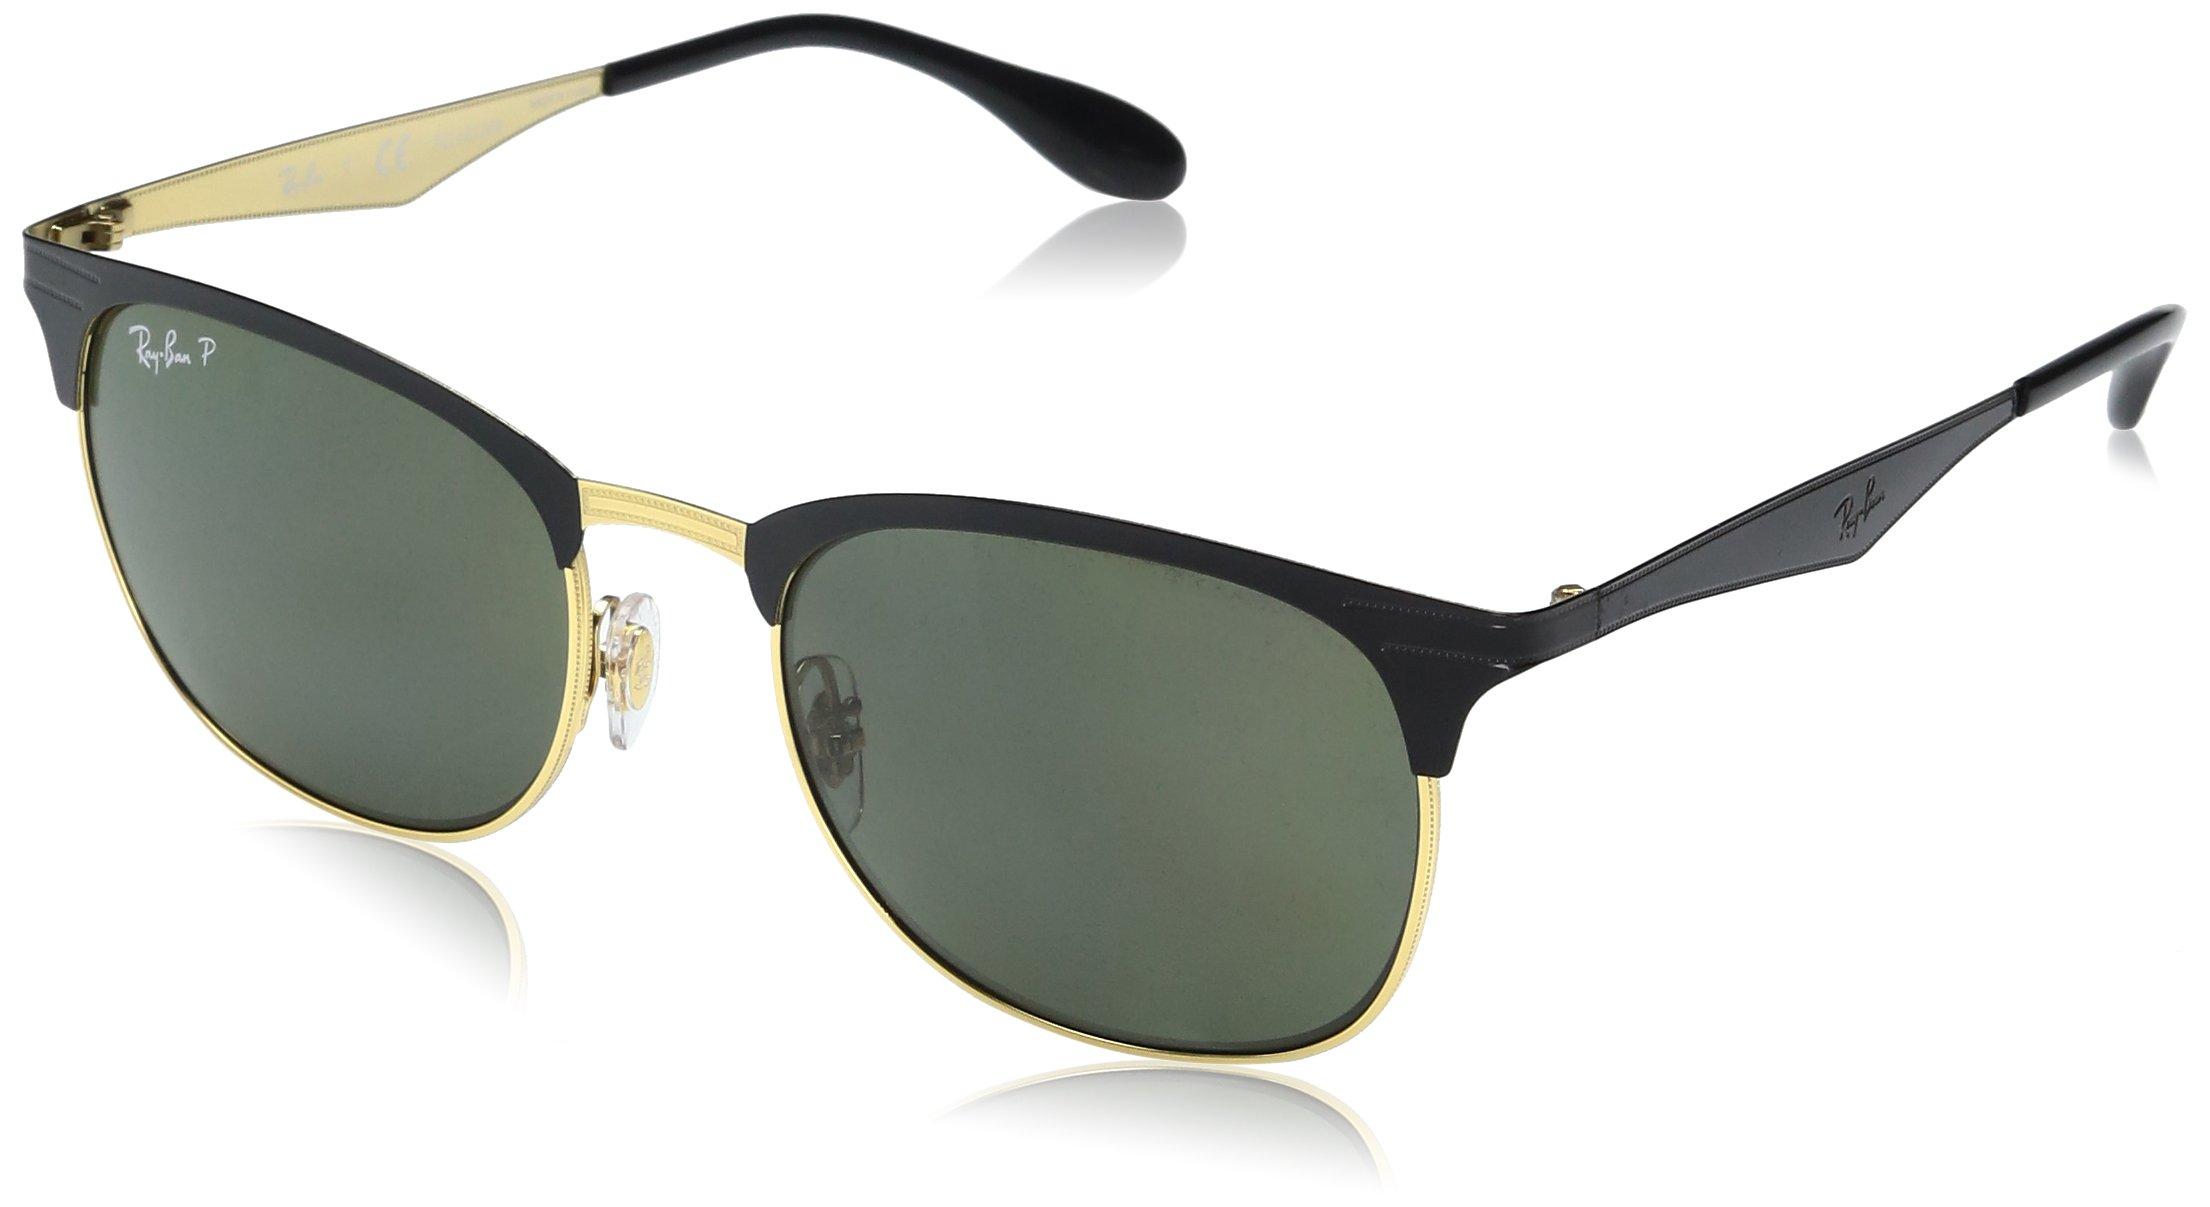 Ray-Ban Metal Unisex Sunglasses - Top Shiny Black on Gold Frame Dark Green Polar Lenses 53mm Polarized